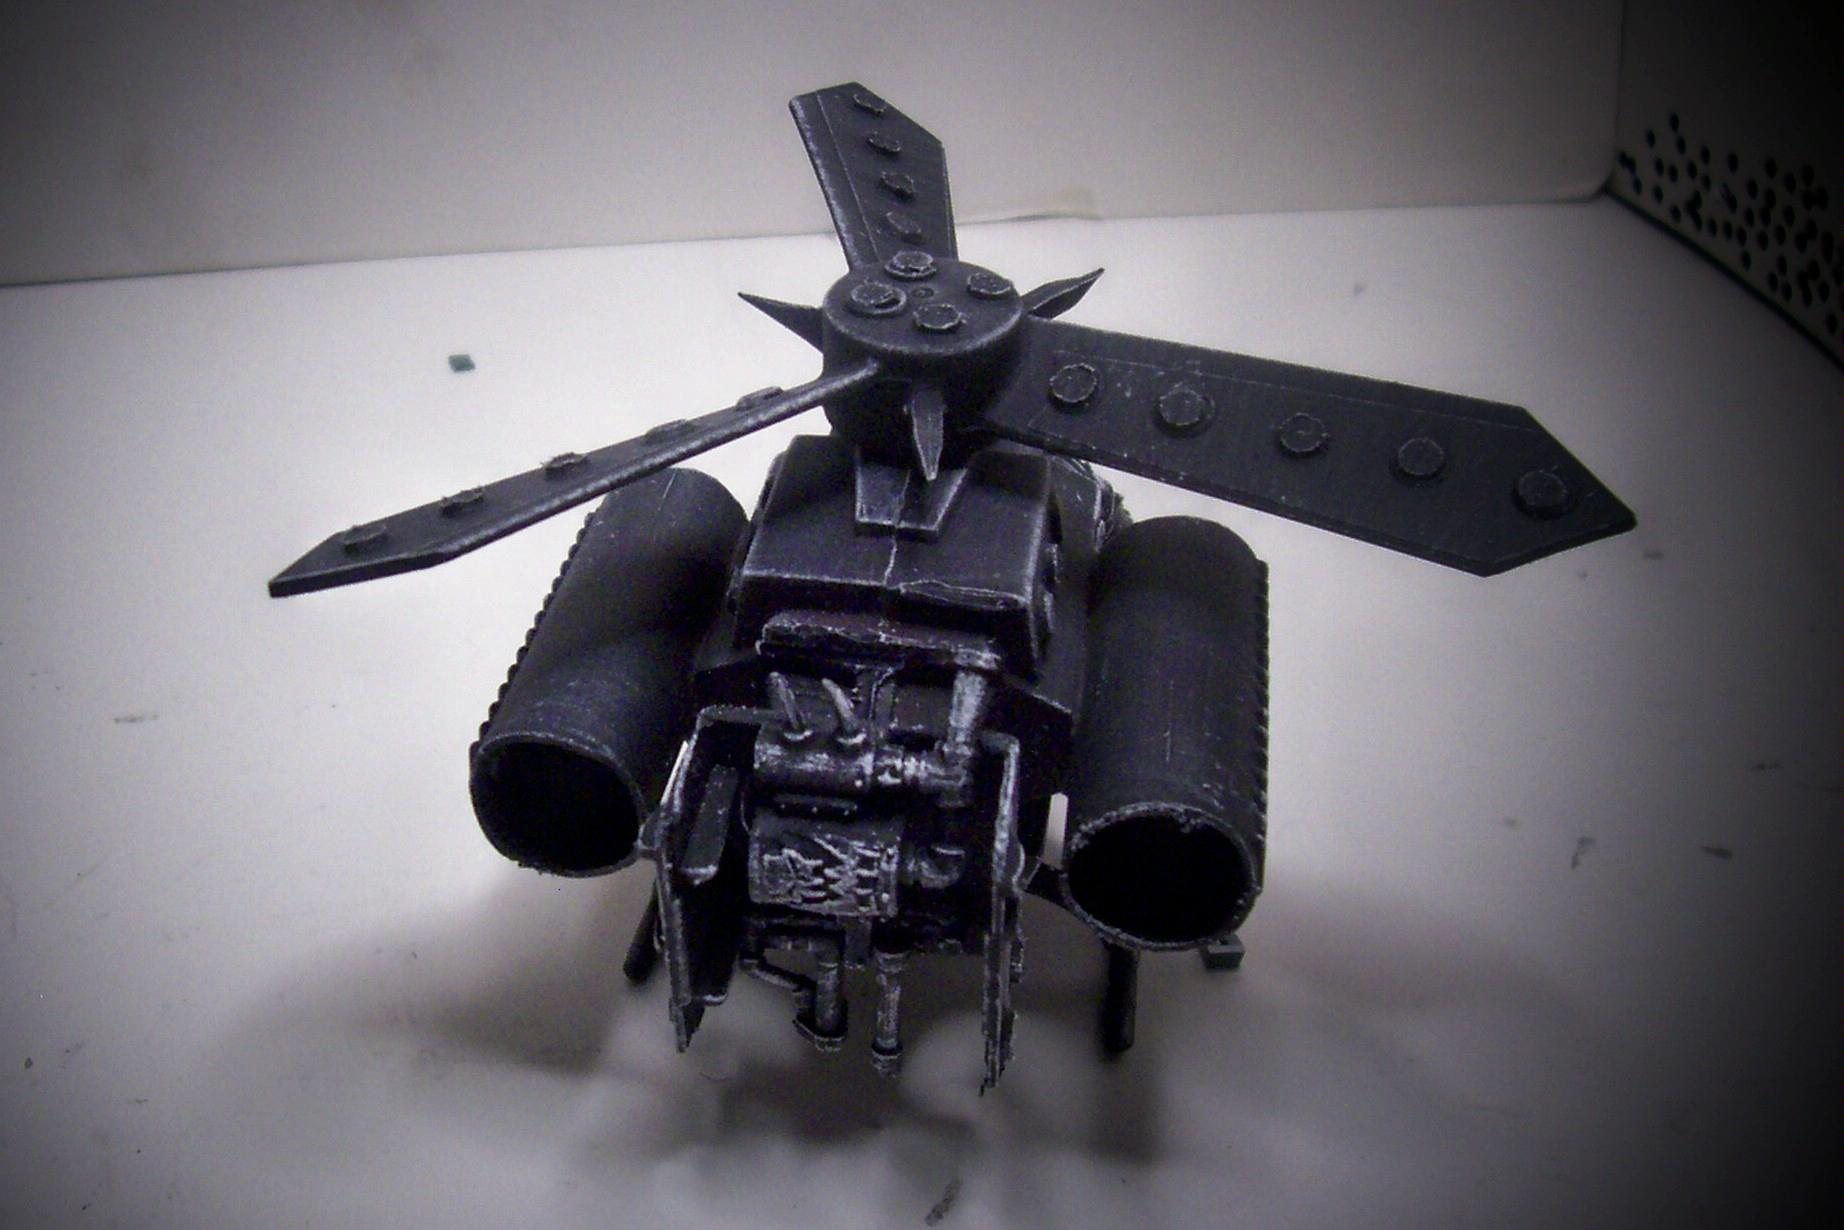 Conversion, Deffkopta, Drybrush, Orks, Toy, Warhammer 40,000